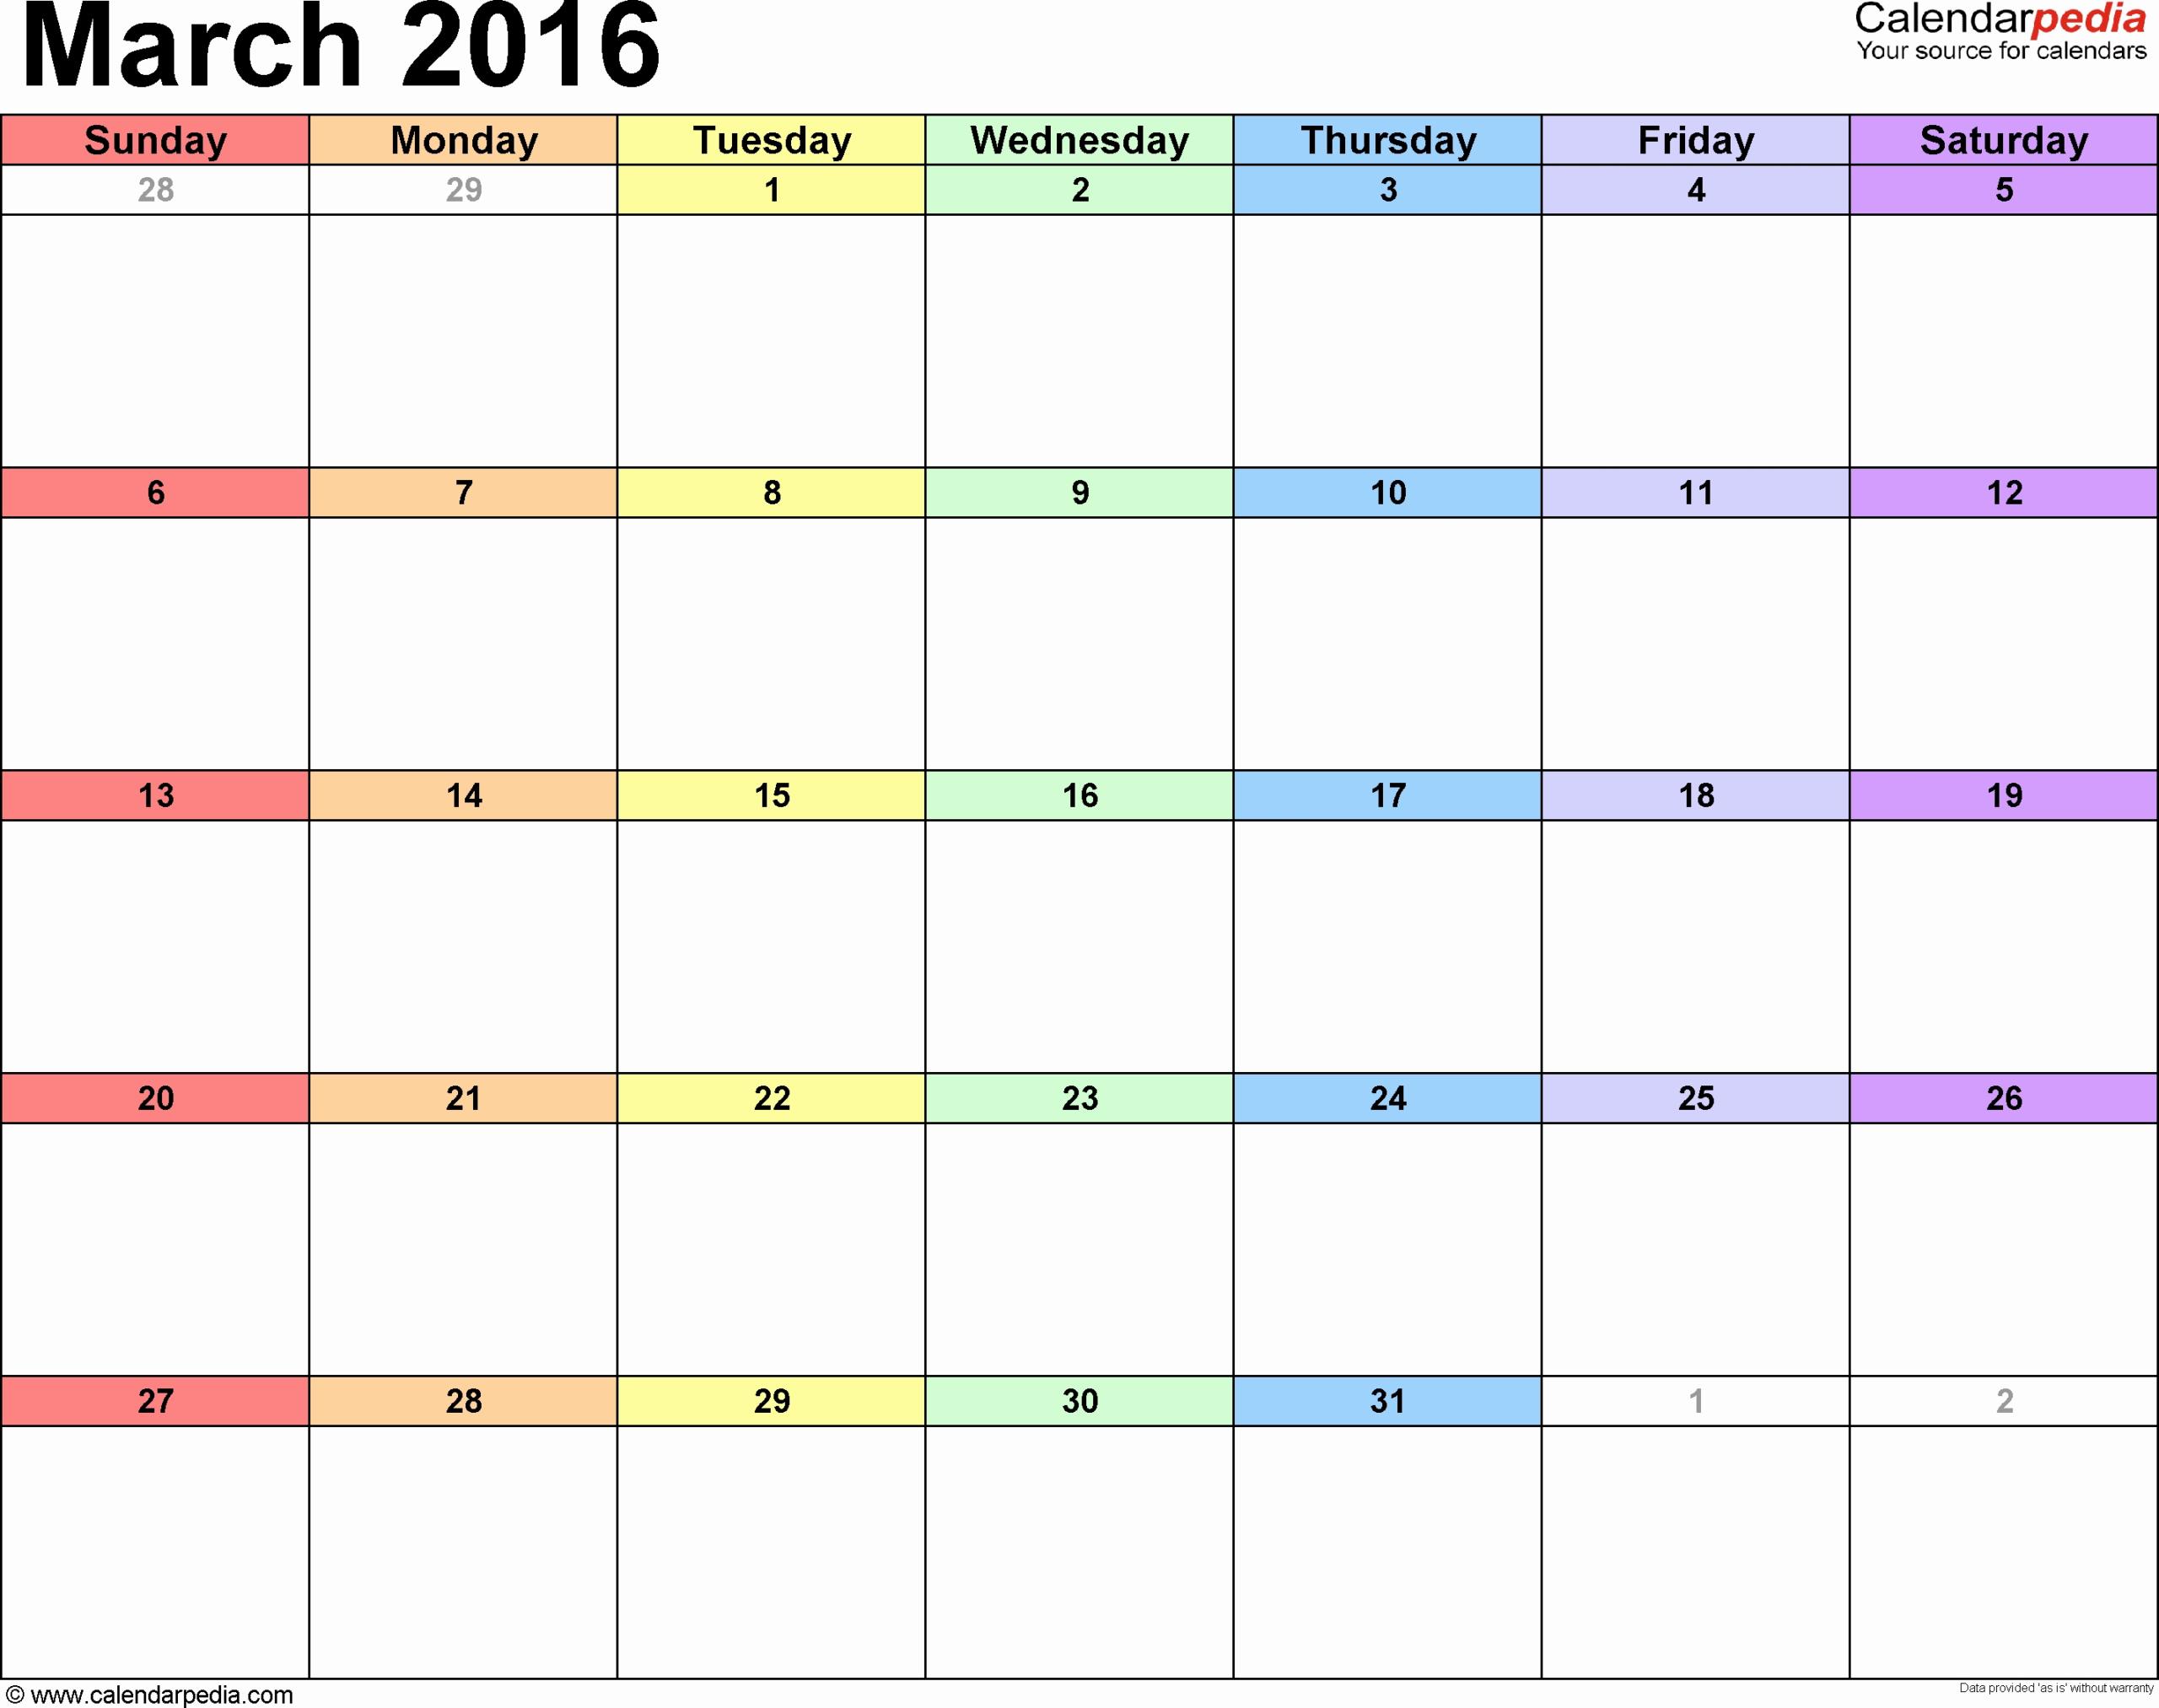 Calendar Template Monday To Sunday  Calendar Inspiration regarding Calendar Monday To Sunday